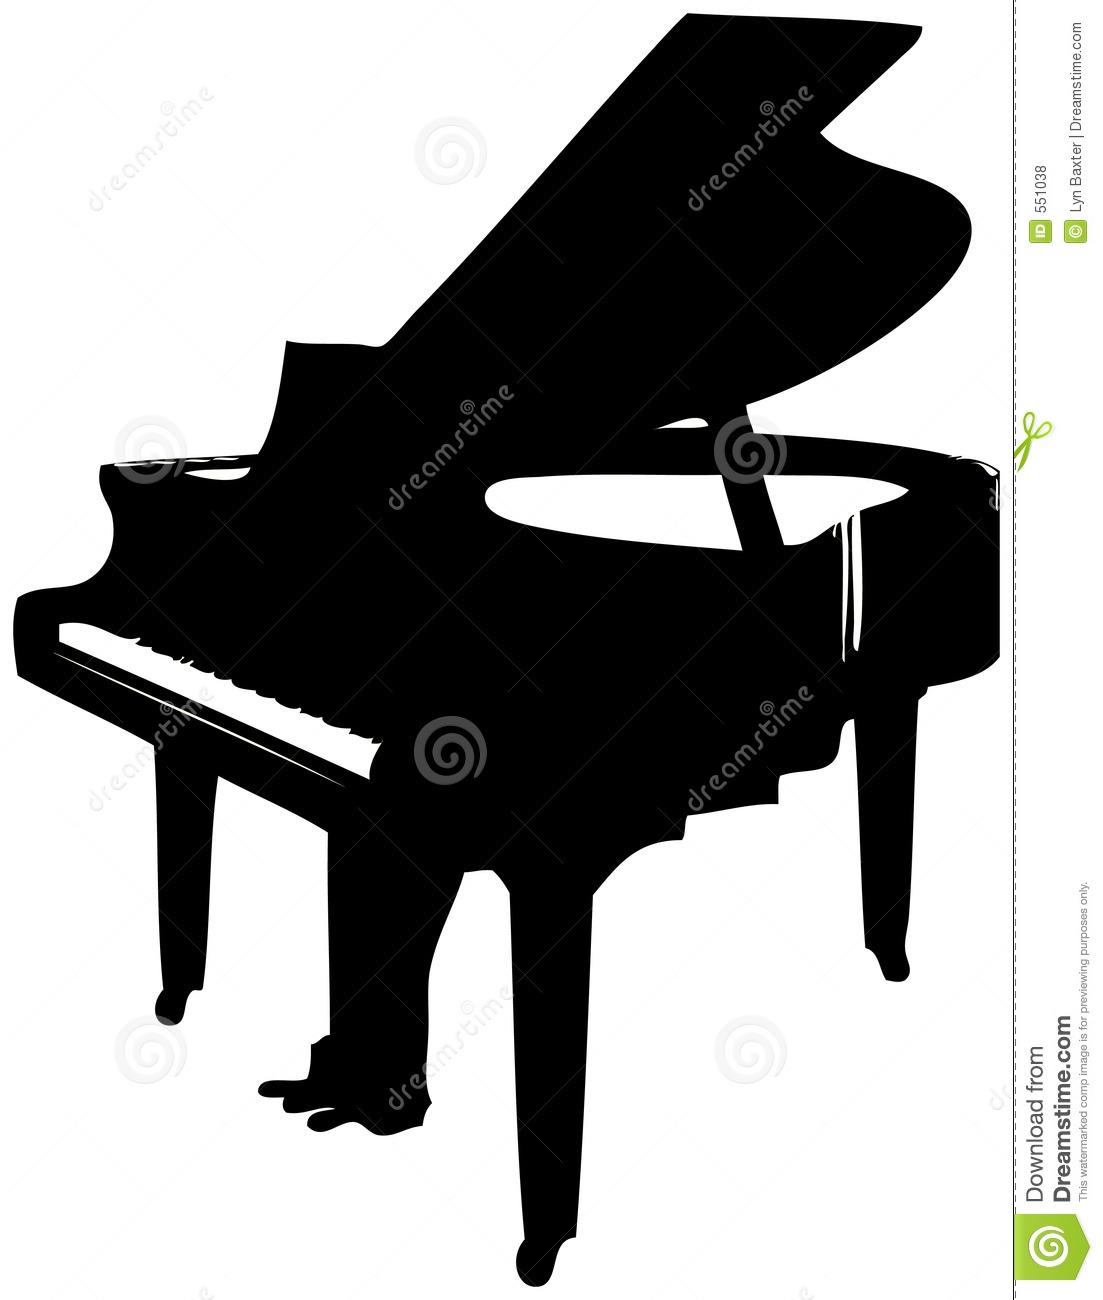 Piano clipart shadow Free grand%20clipart Clipart Panda Grand